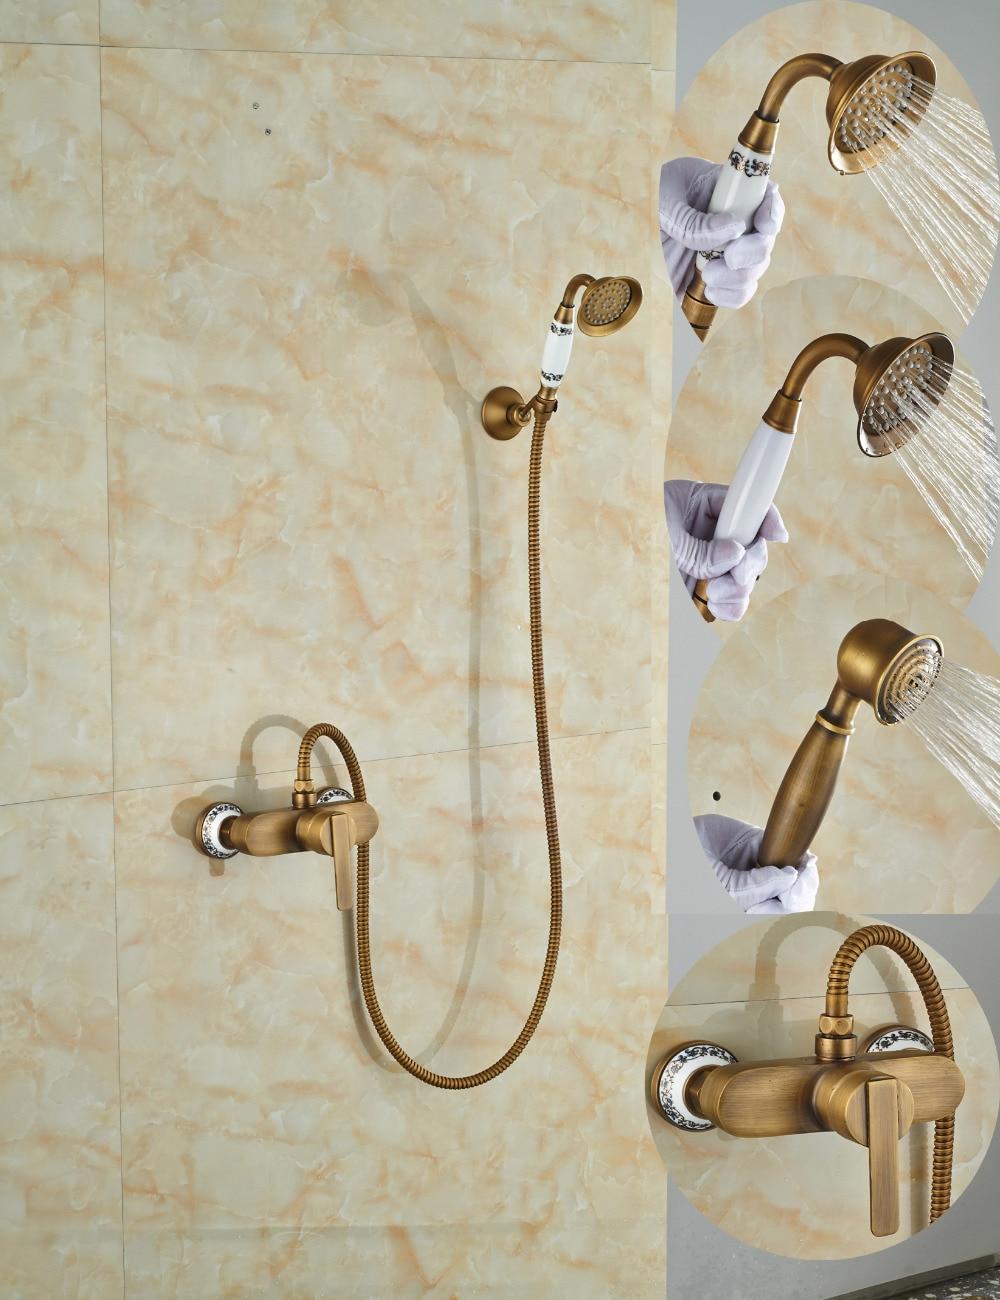 Wholesale And Retail Promotion Antique Brass Bathroom Tub Faucet Single Handle Valve Mixer Tap Ceramic Base Style Tub Faucet цена и фото